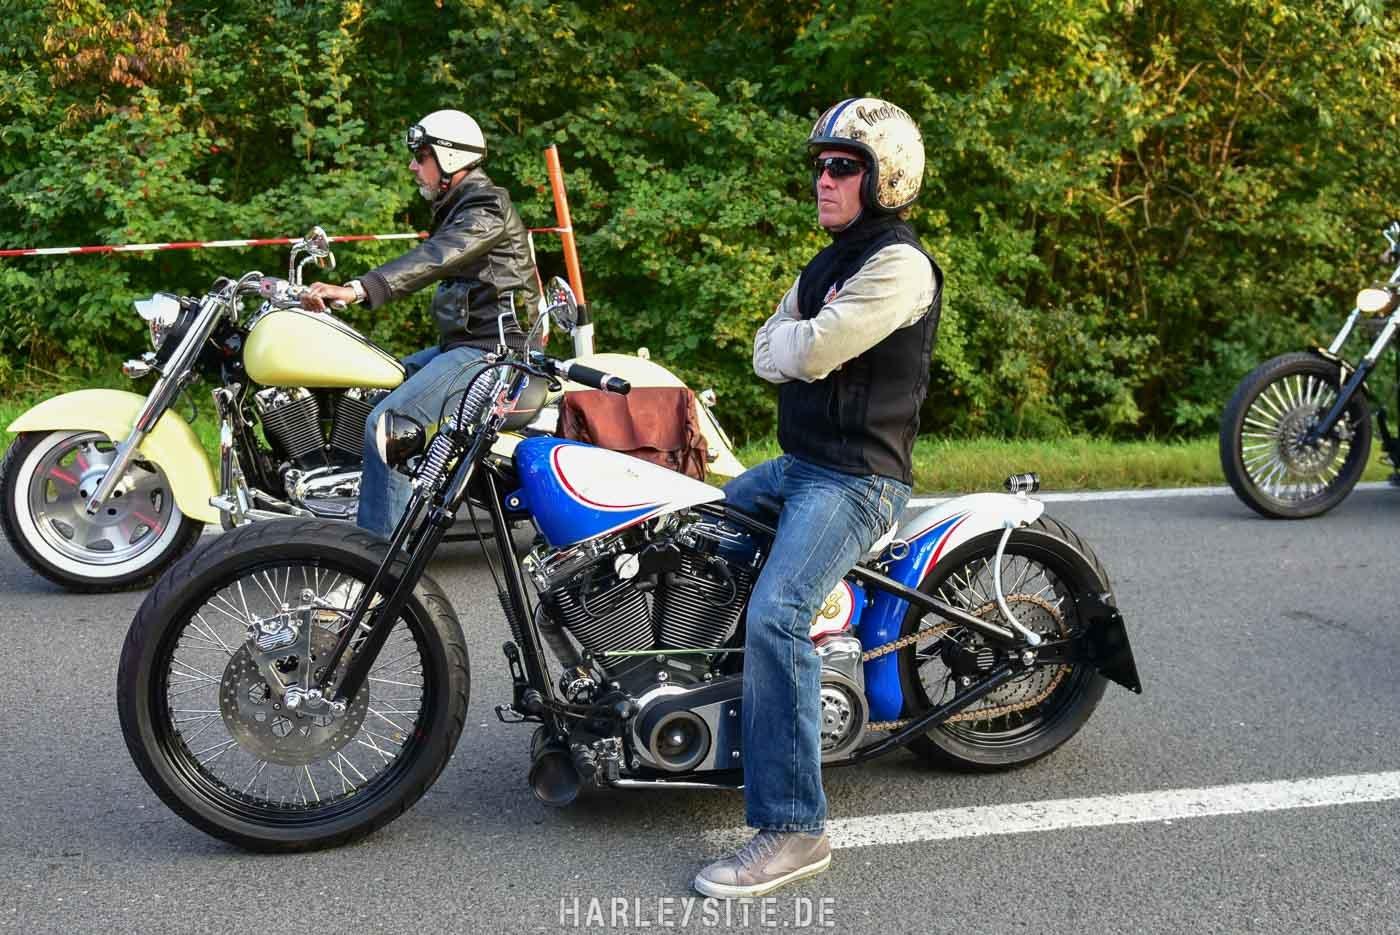 European-Bike-Week-9469